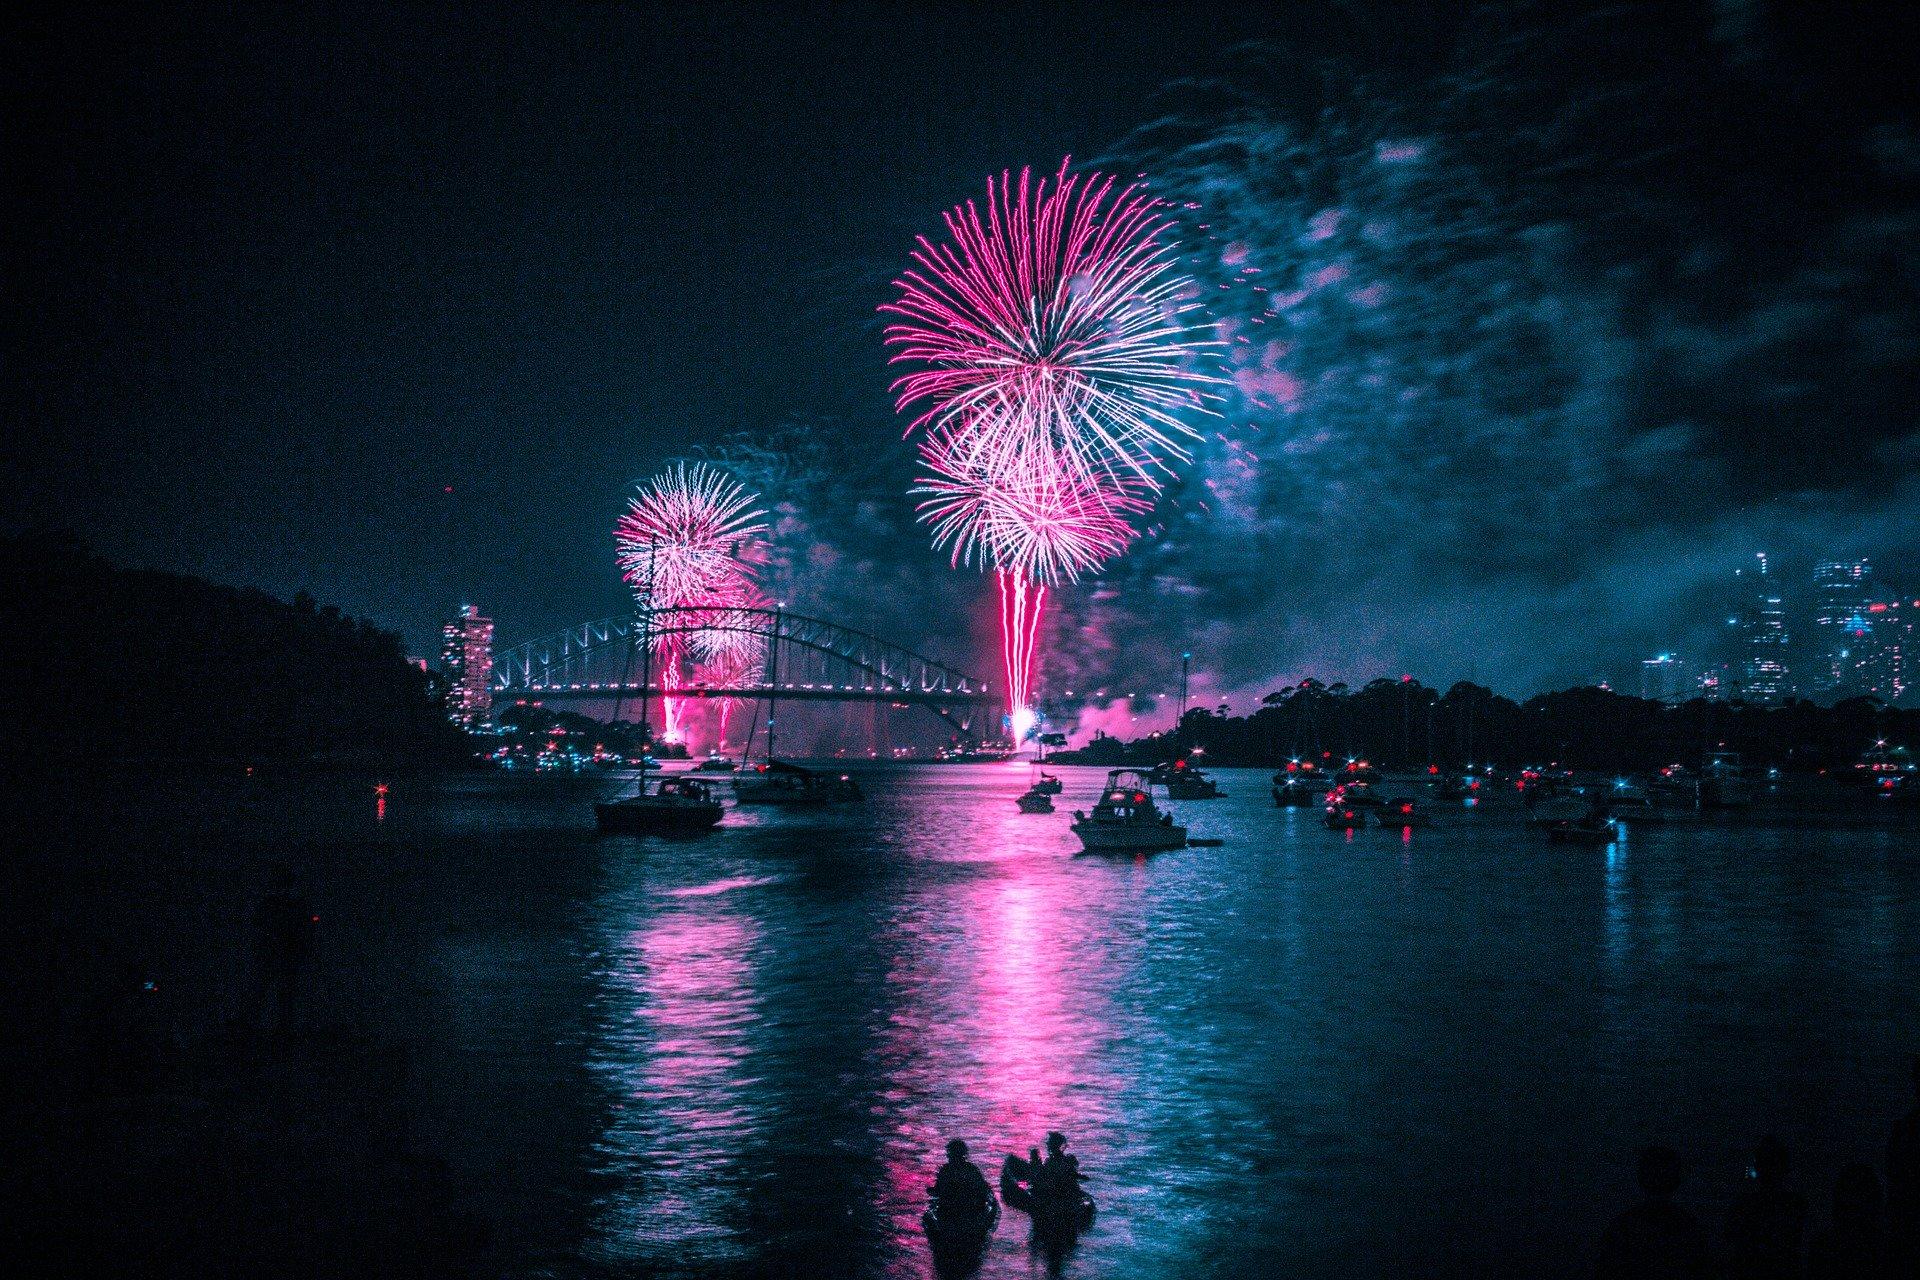 fireworks-4021214_1920